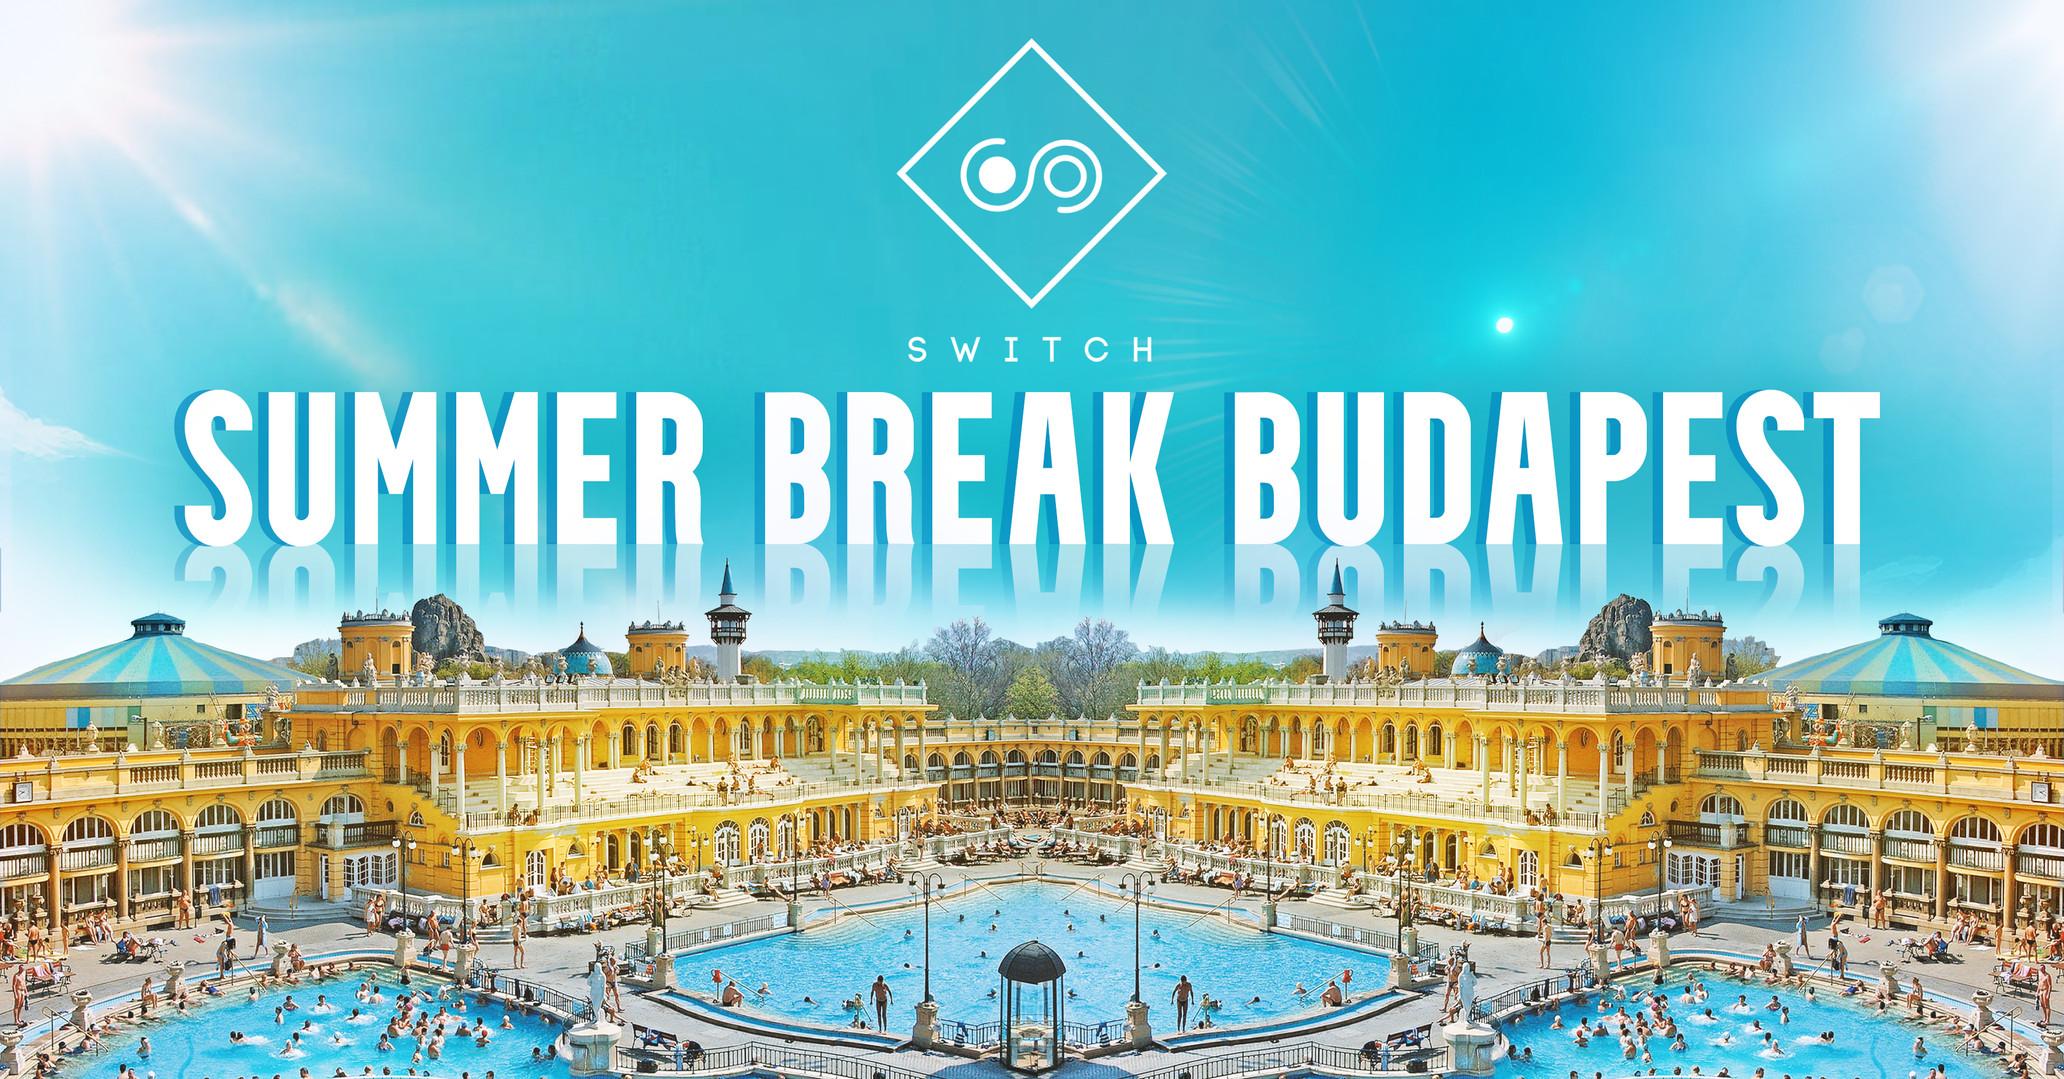 Switch Summer Break Budapest